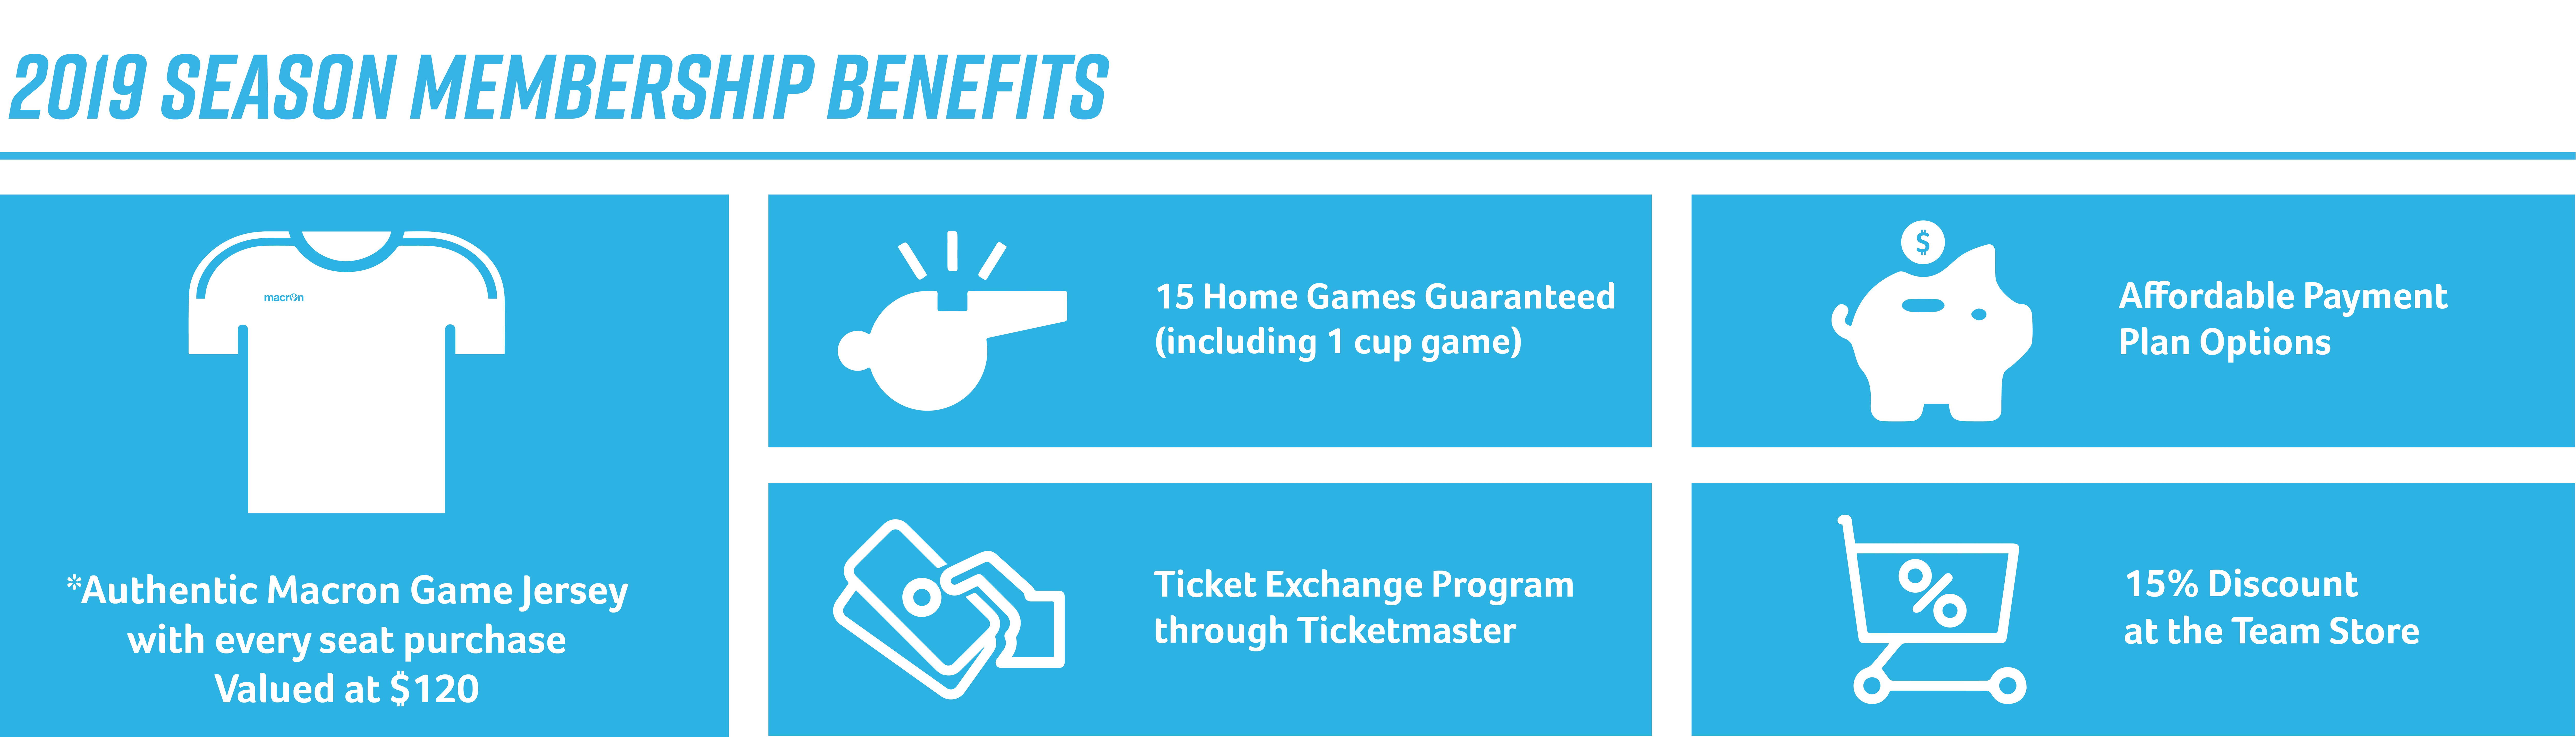 membership_benefits